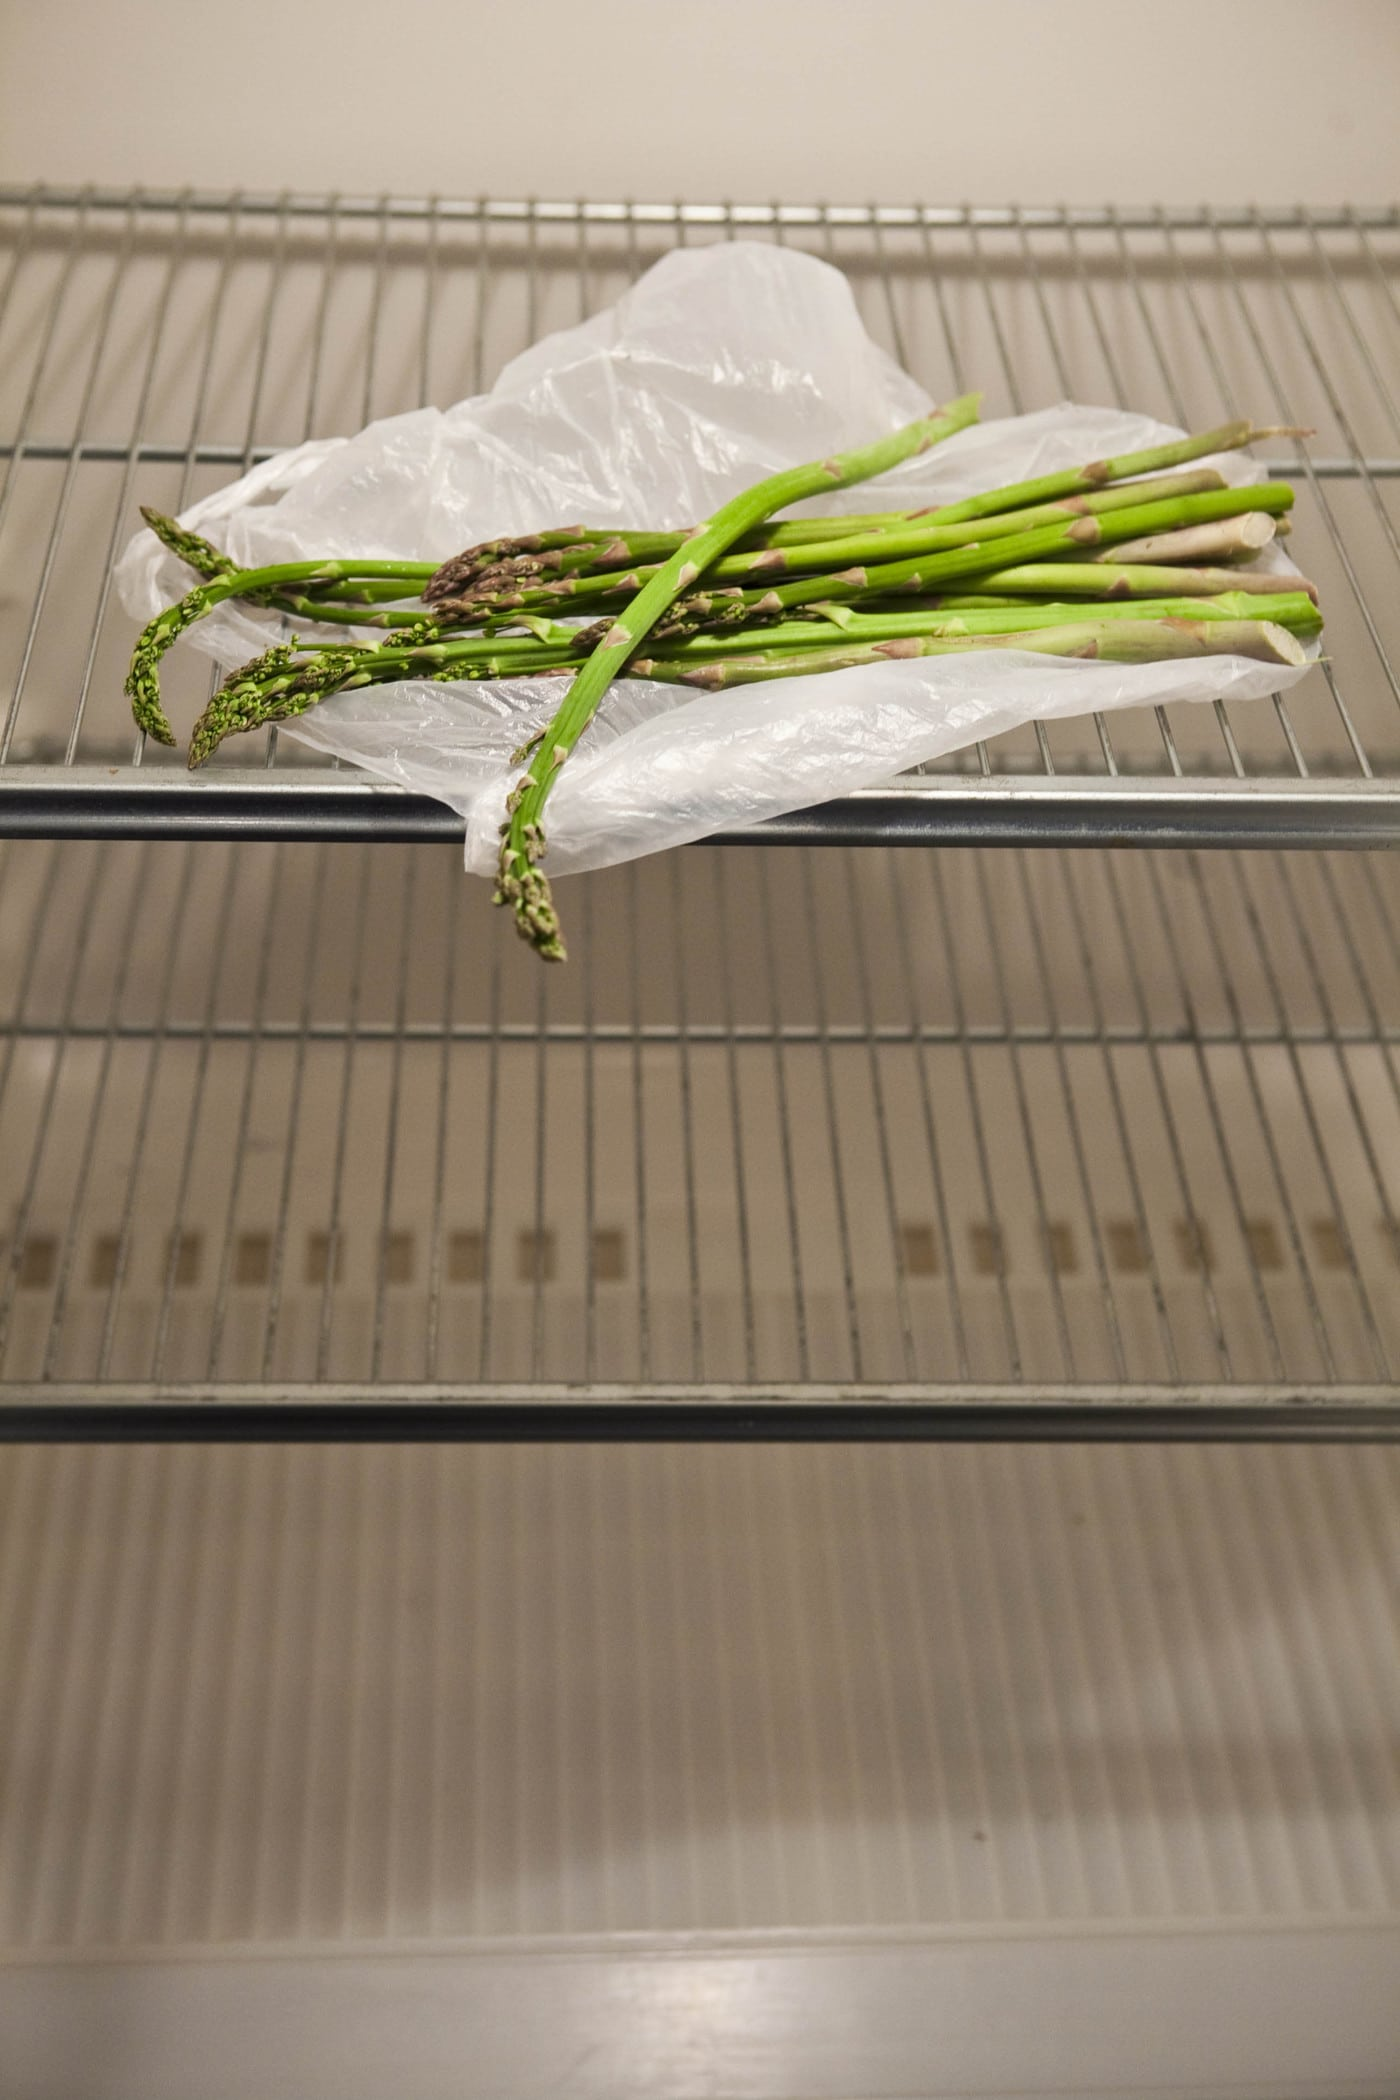 Asparagus in my empty fridge